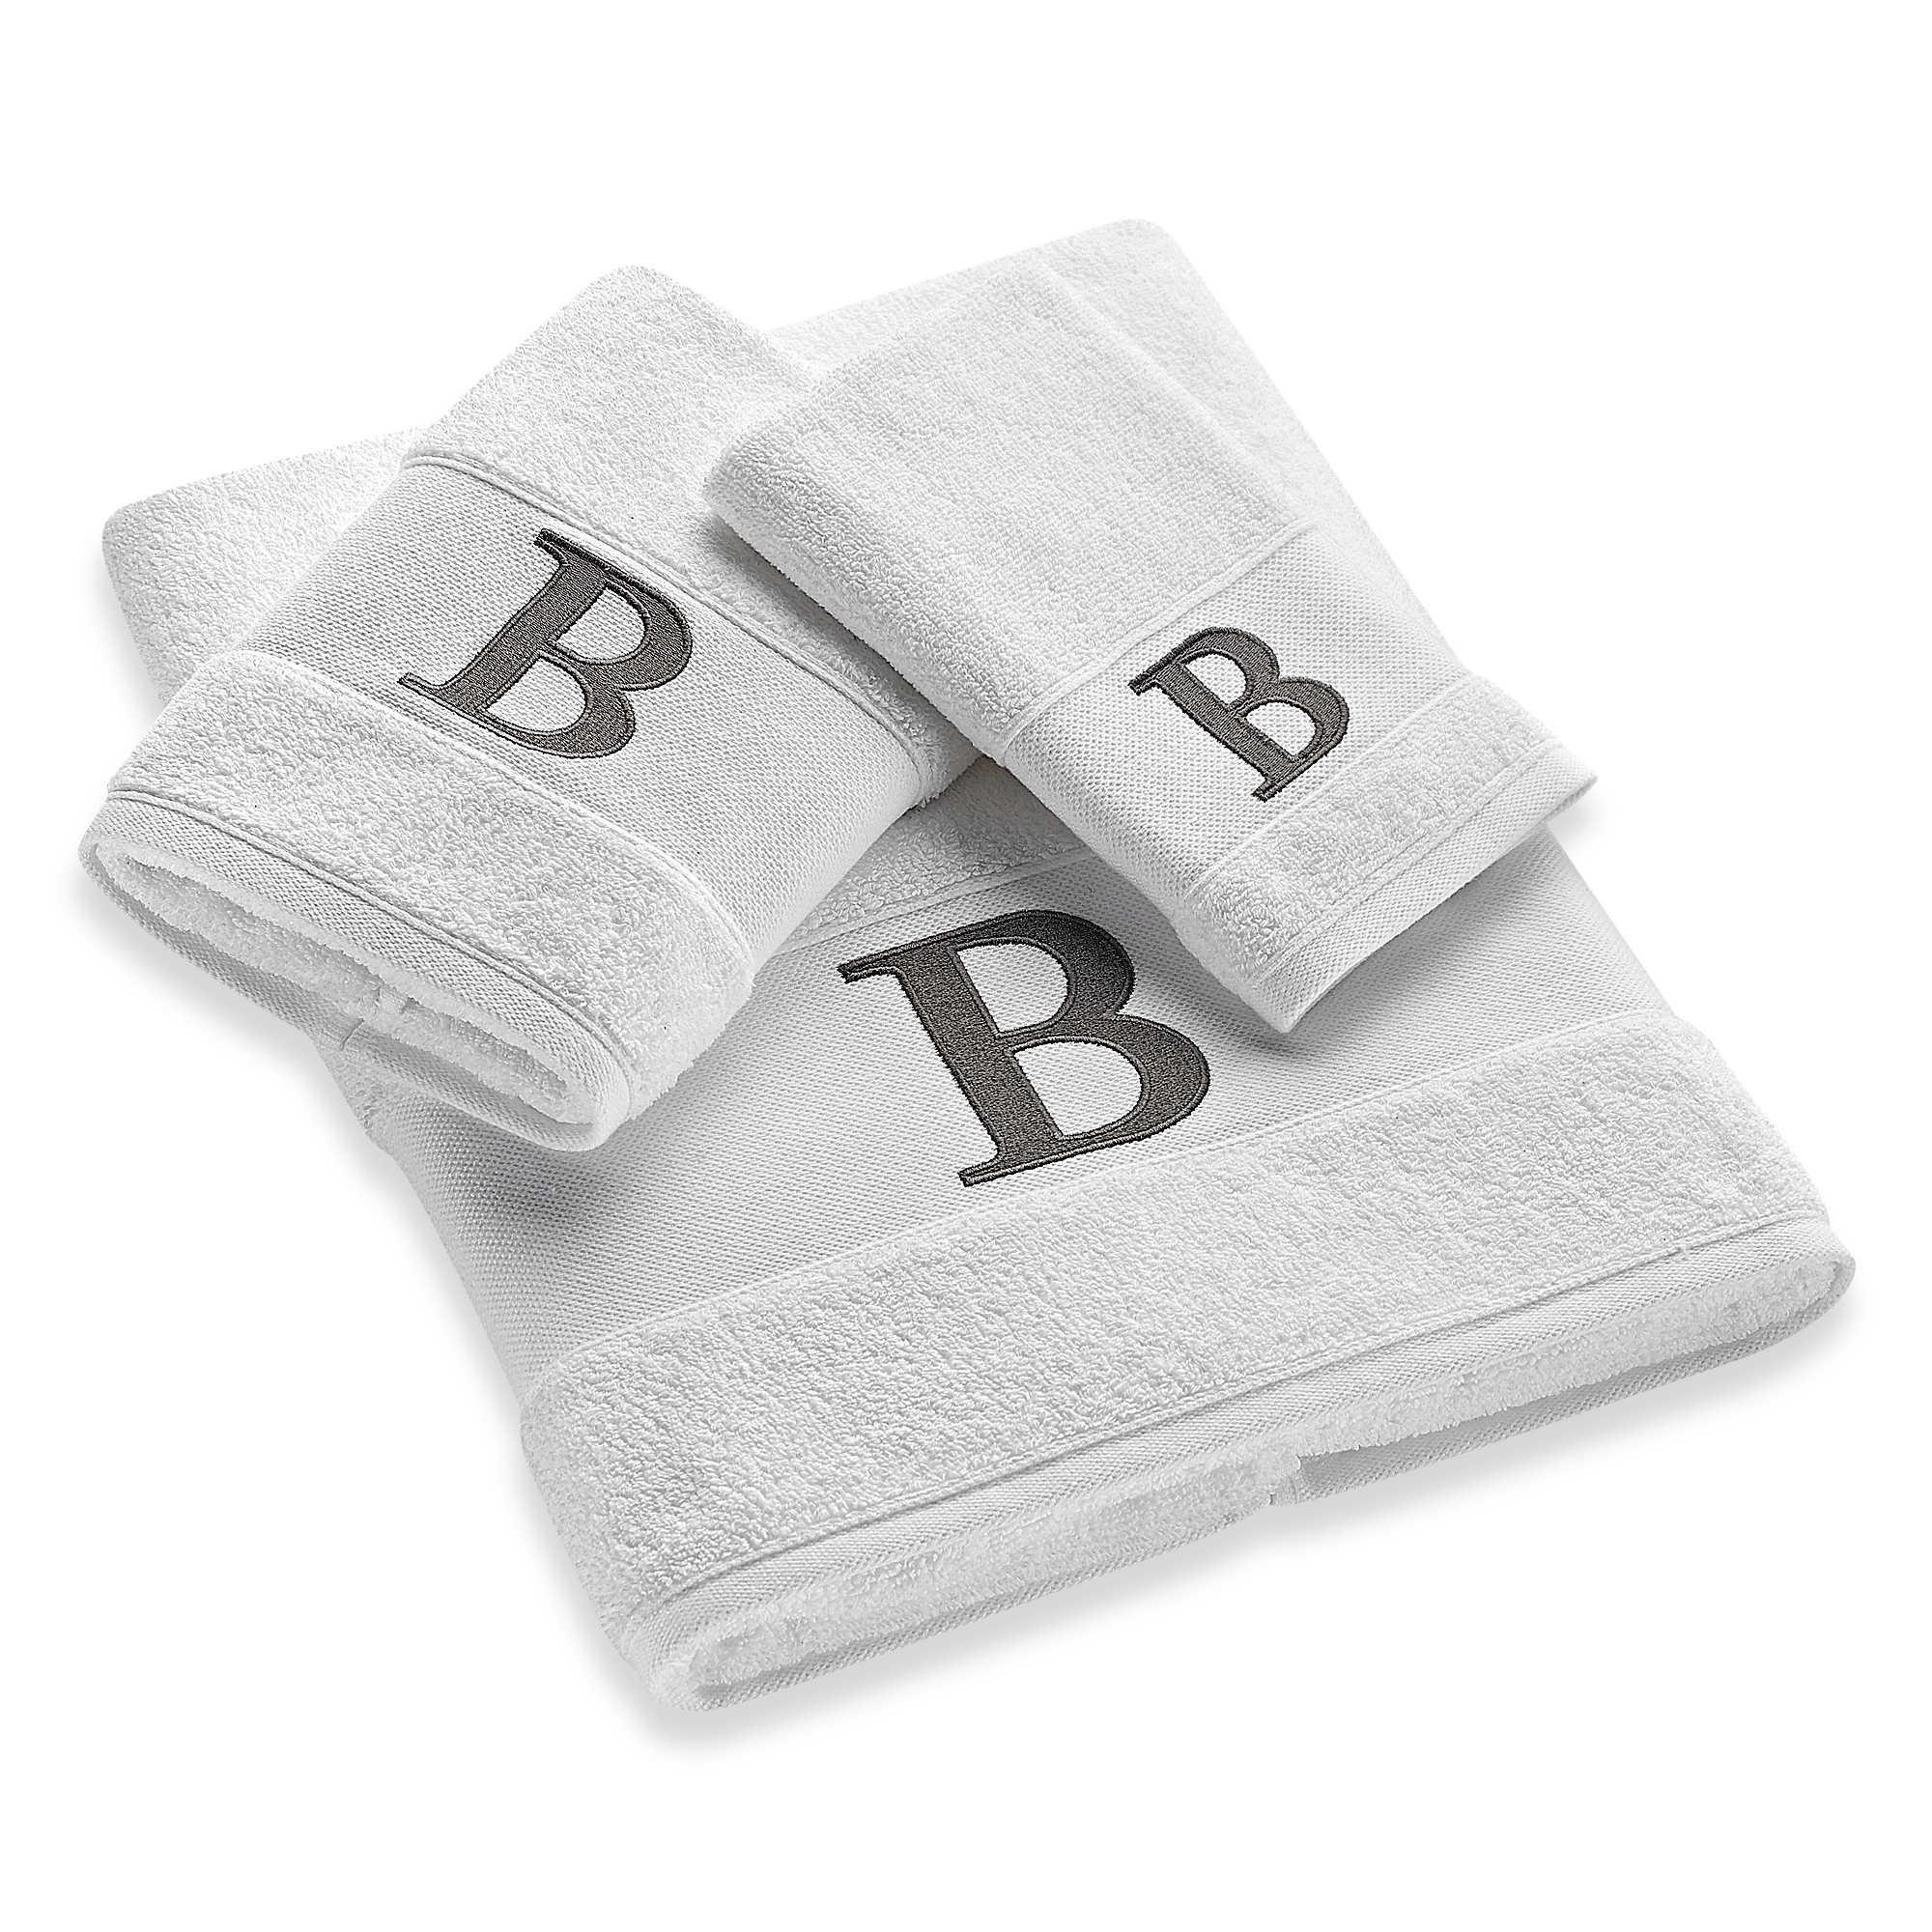 Wedding Registry Checklist Bed Bath Beyond